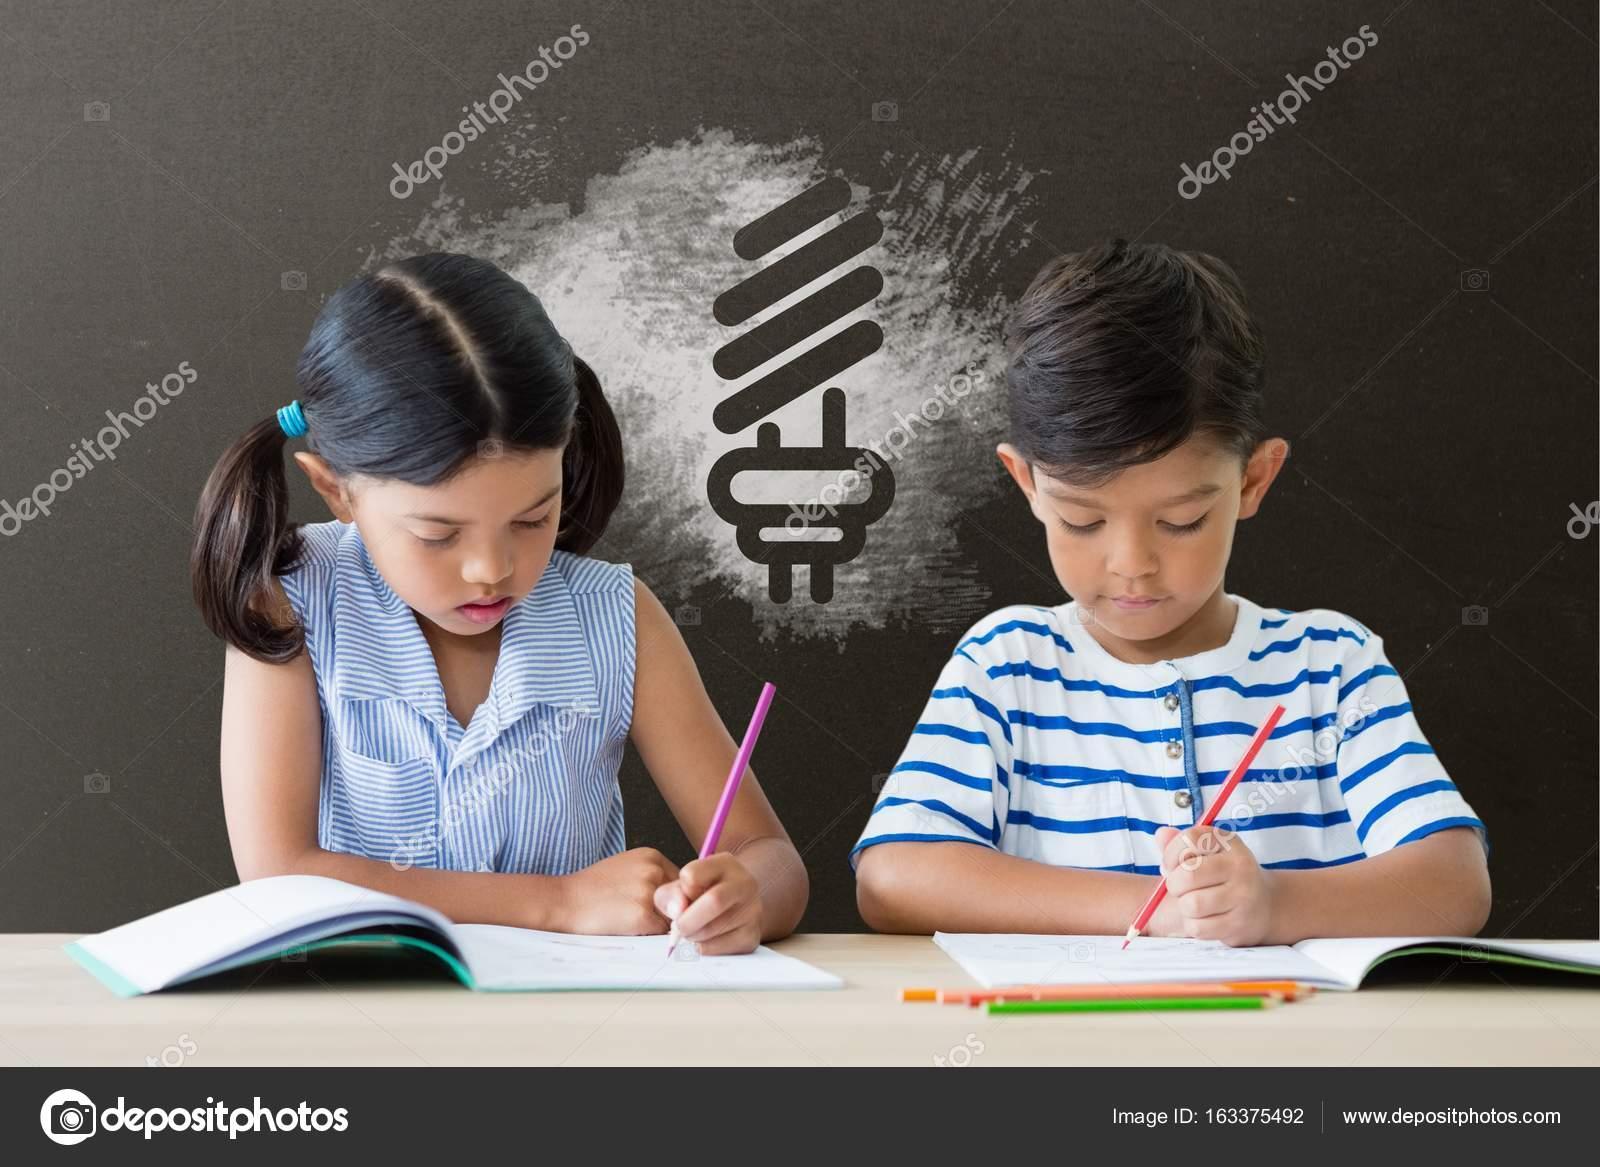 Studenten in Tabelle schreiben — Stockfoto © vectorfusionart #163375492